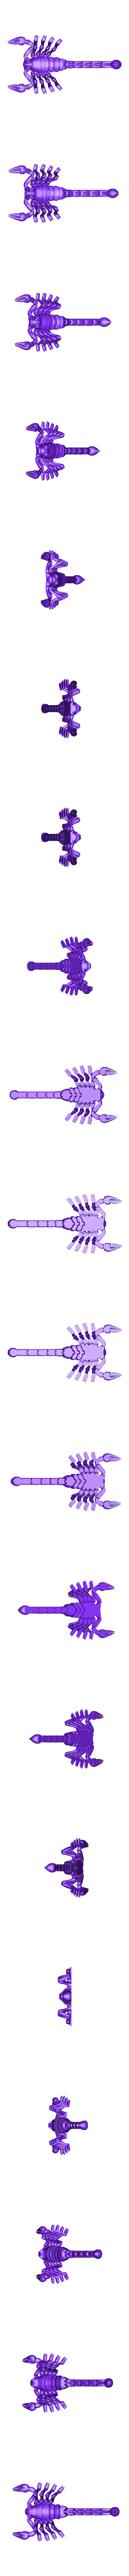 Flexi_Scorpion.STL Download STL file Flexi Print-In-Place Scorpion • 3D printer object, FlexiFactory